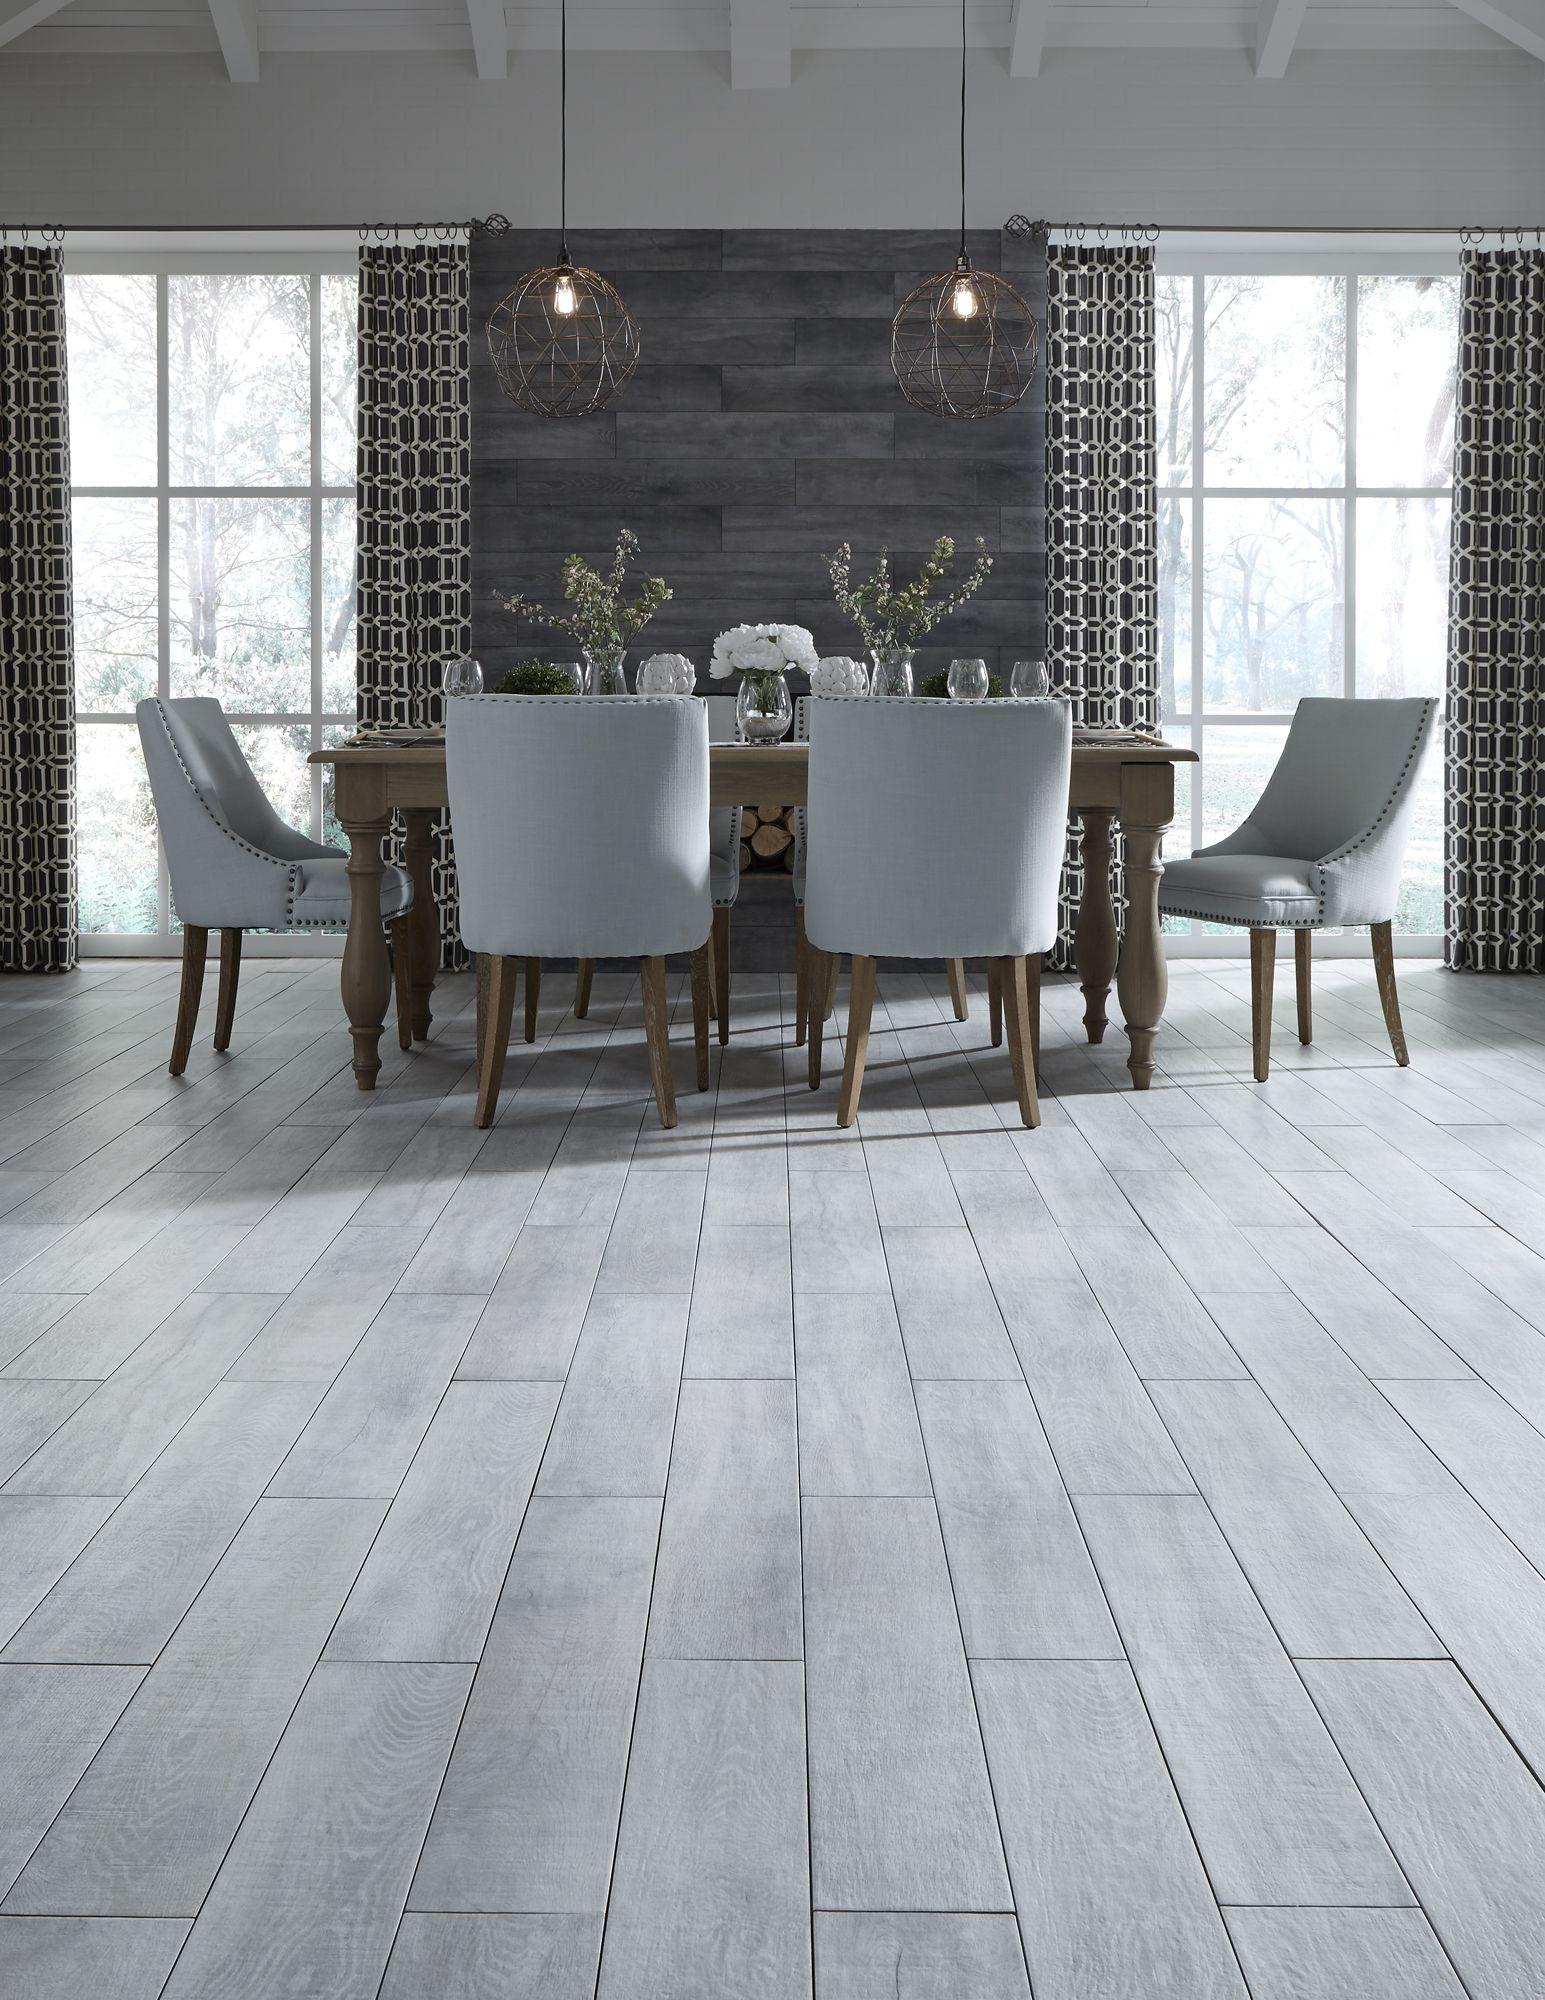 Black tile flooring for elegant look - Waterproof Wood Look Tile Gives Any Room The Elegant Look Of Hardwood Styles Like